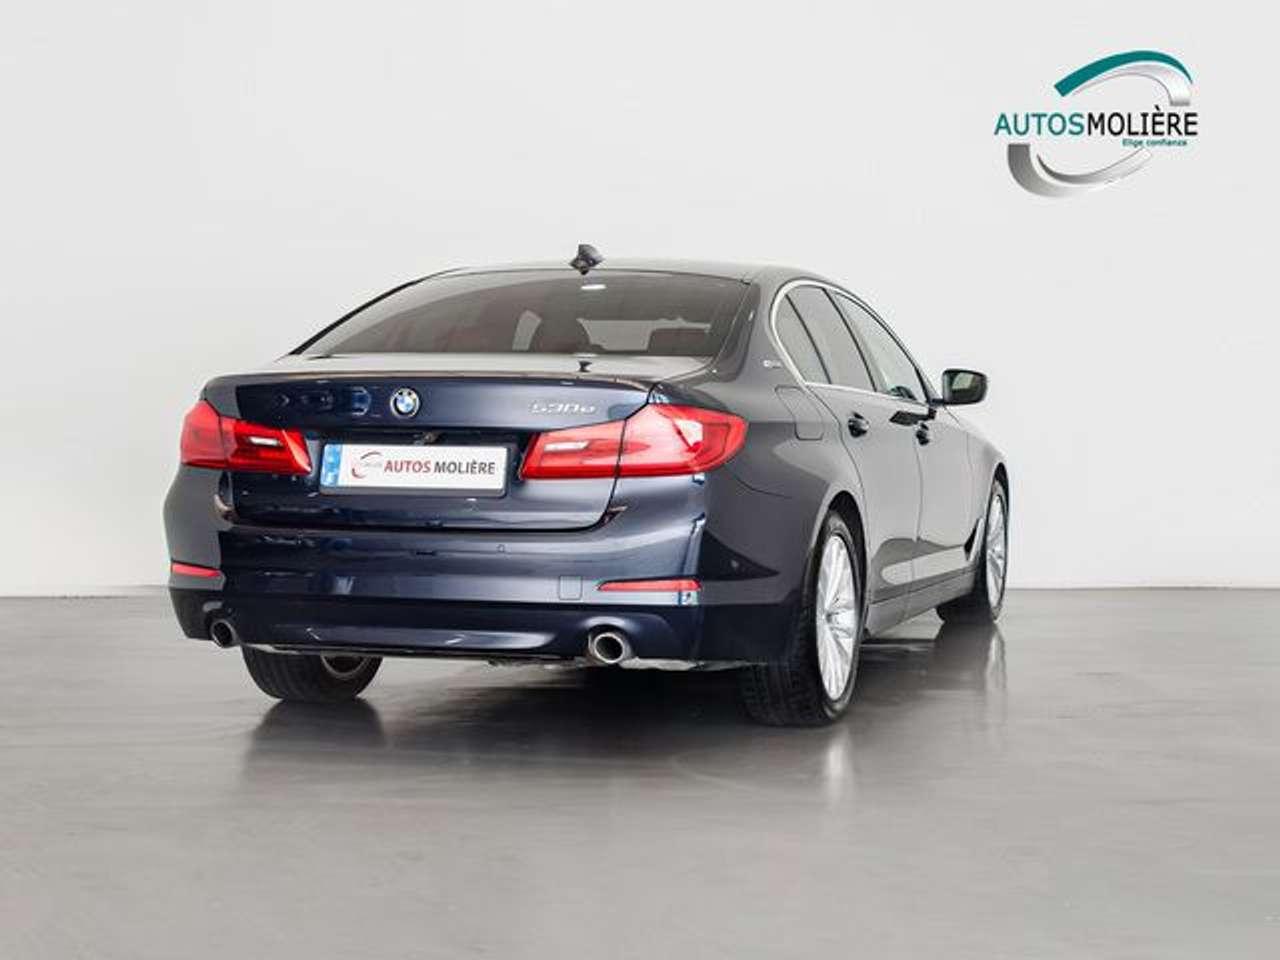 Coches por BMW 7-Series